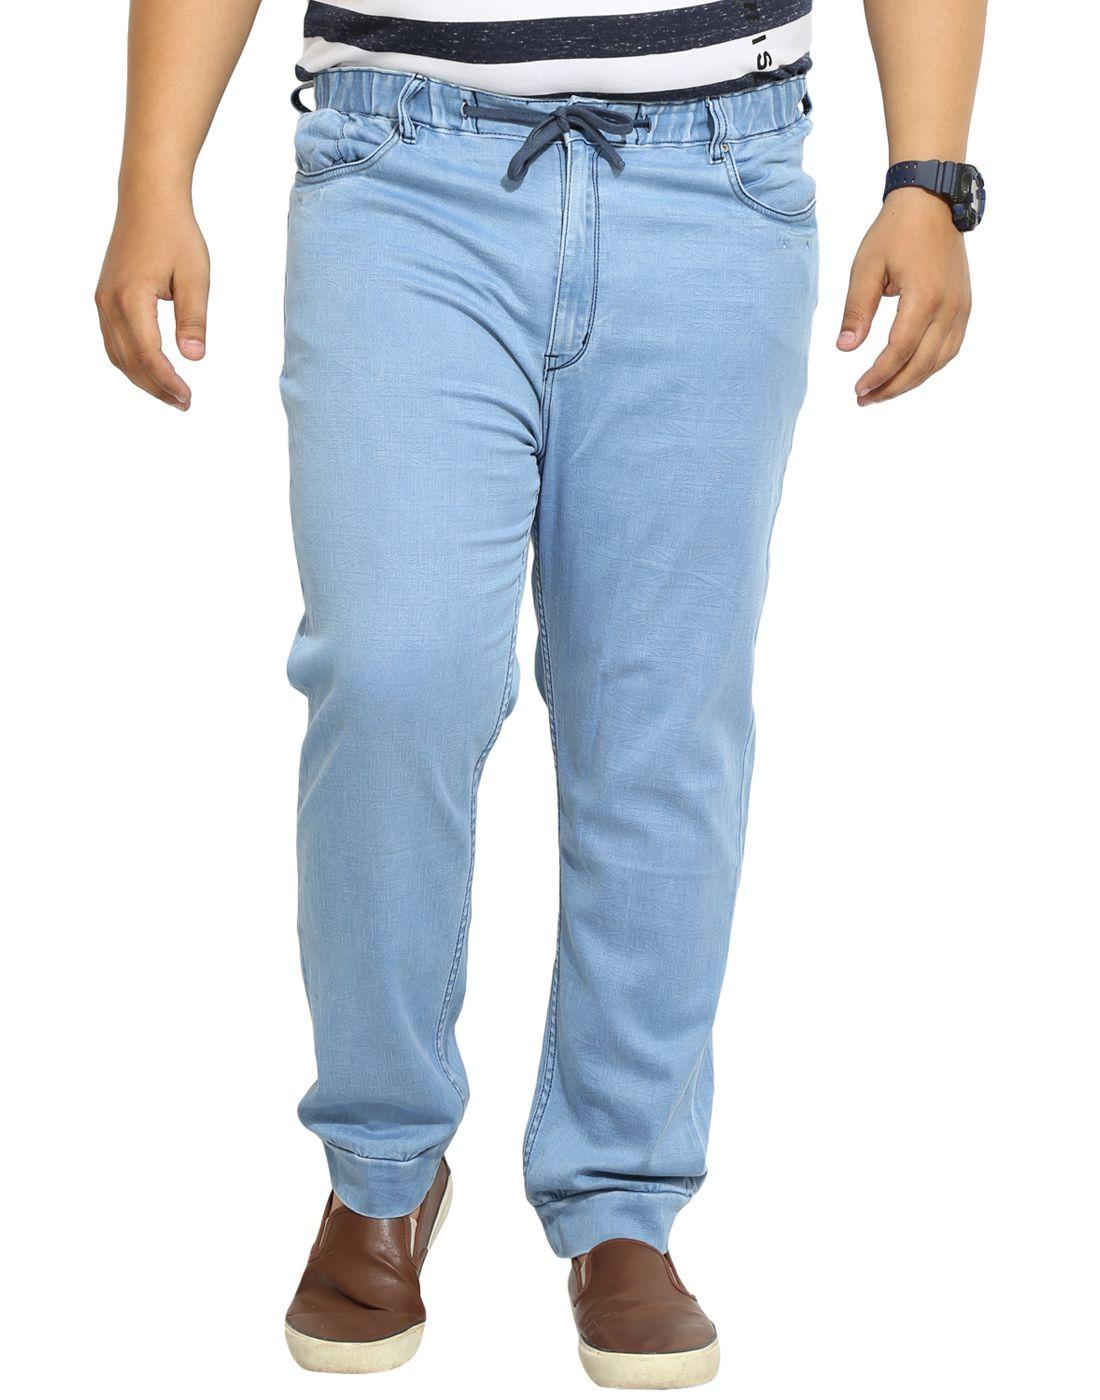 John Pride Light Blue Slim Jeans